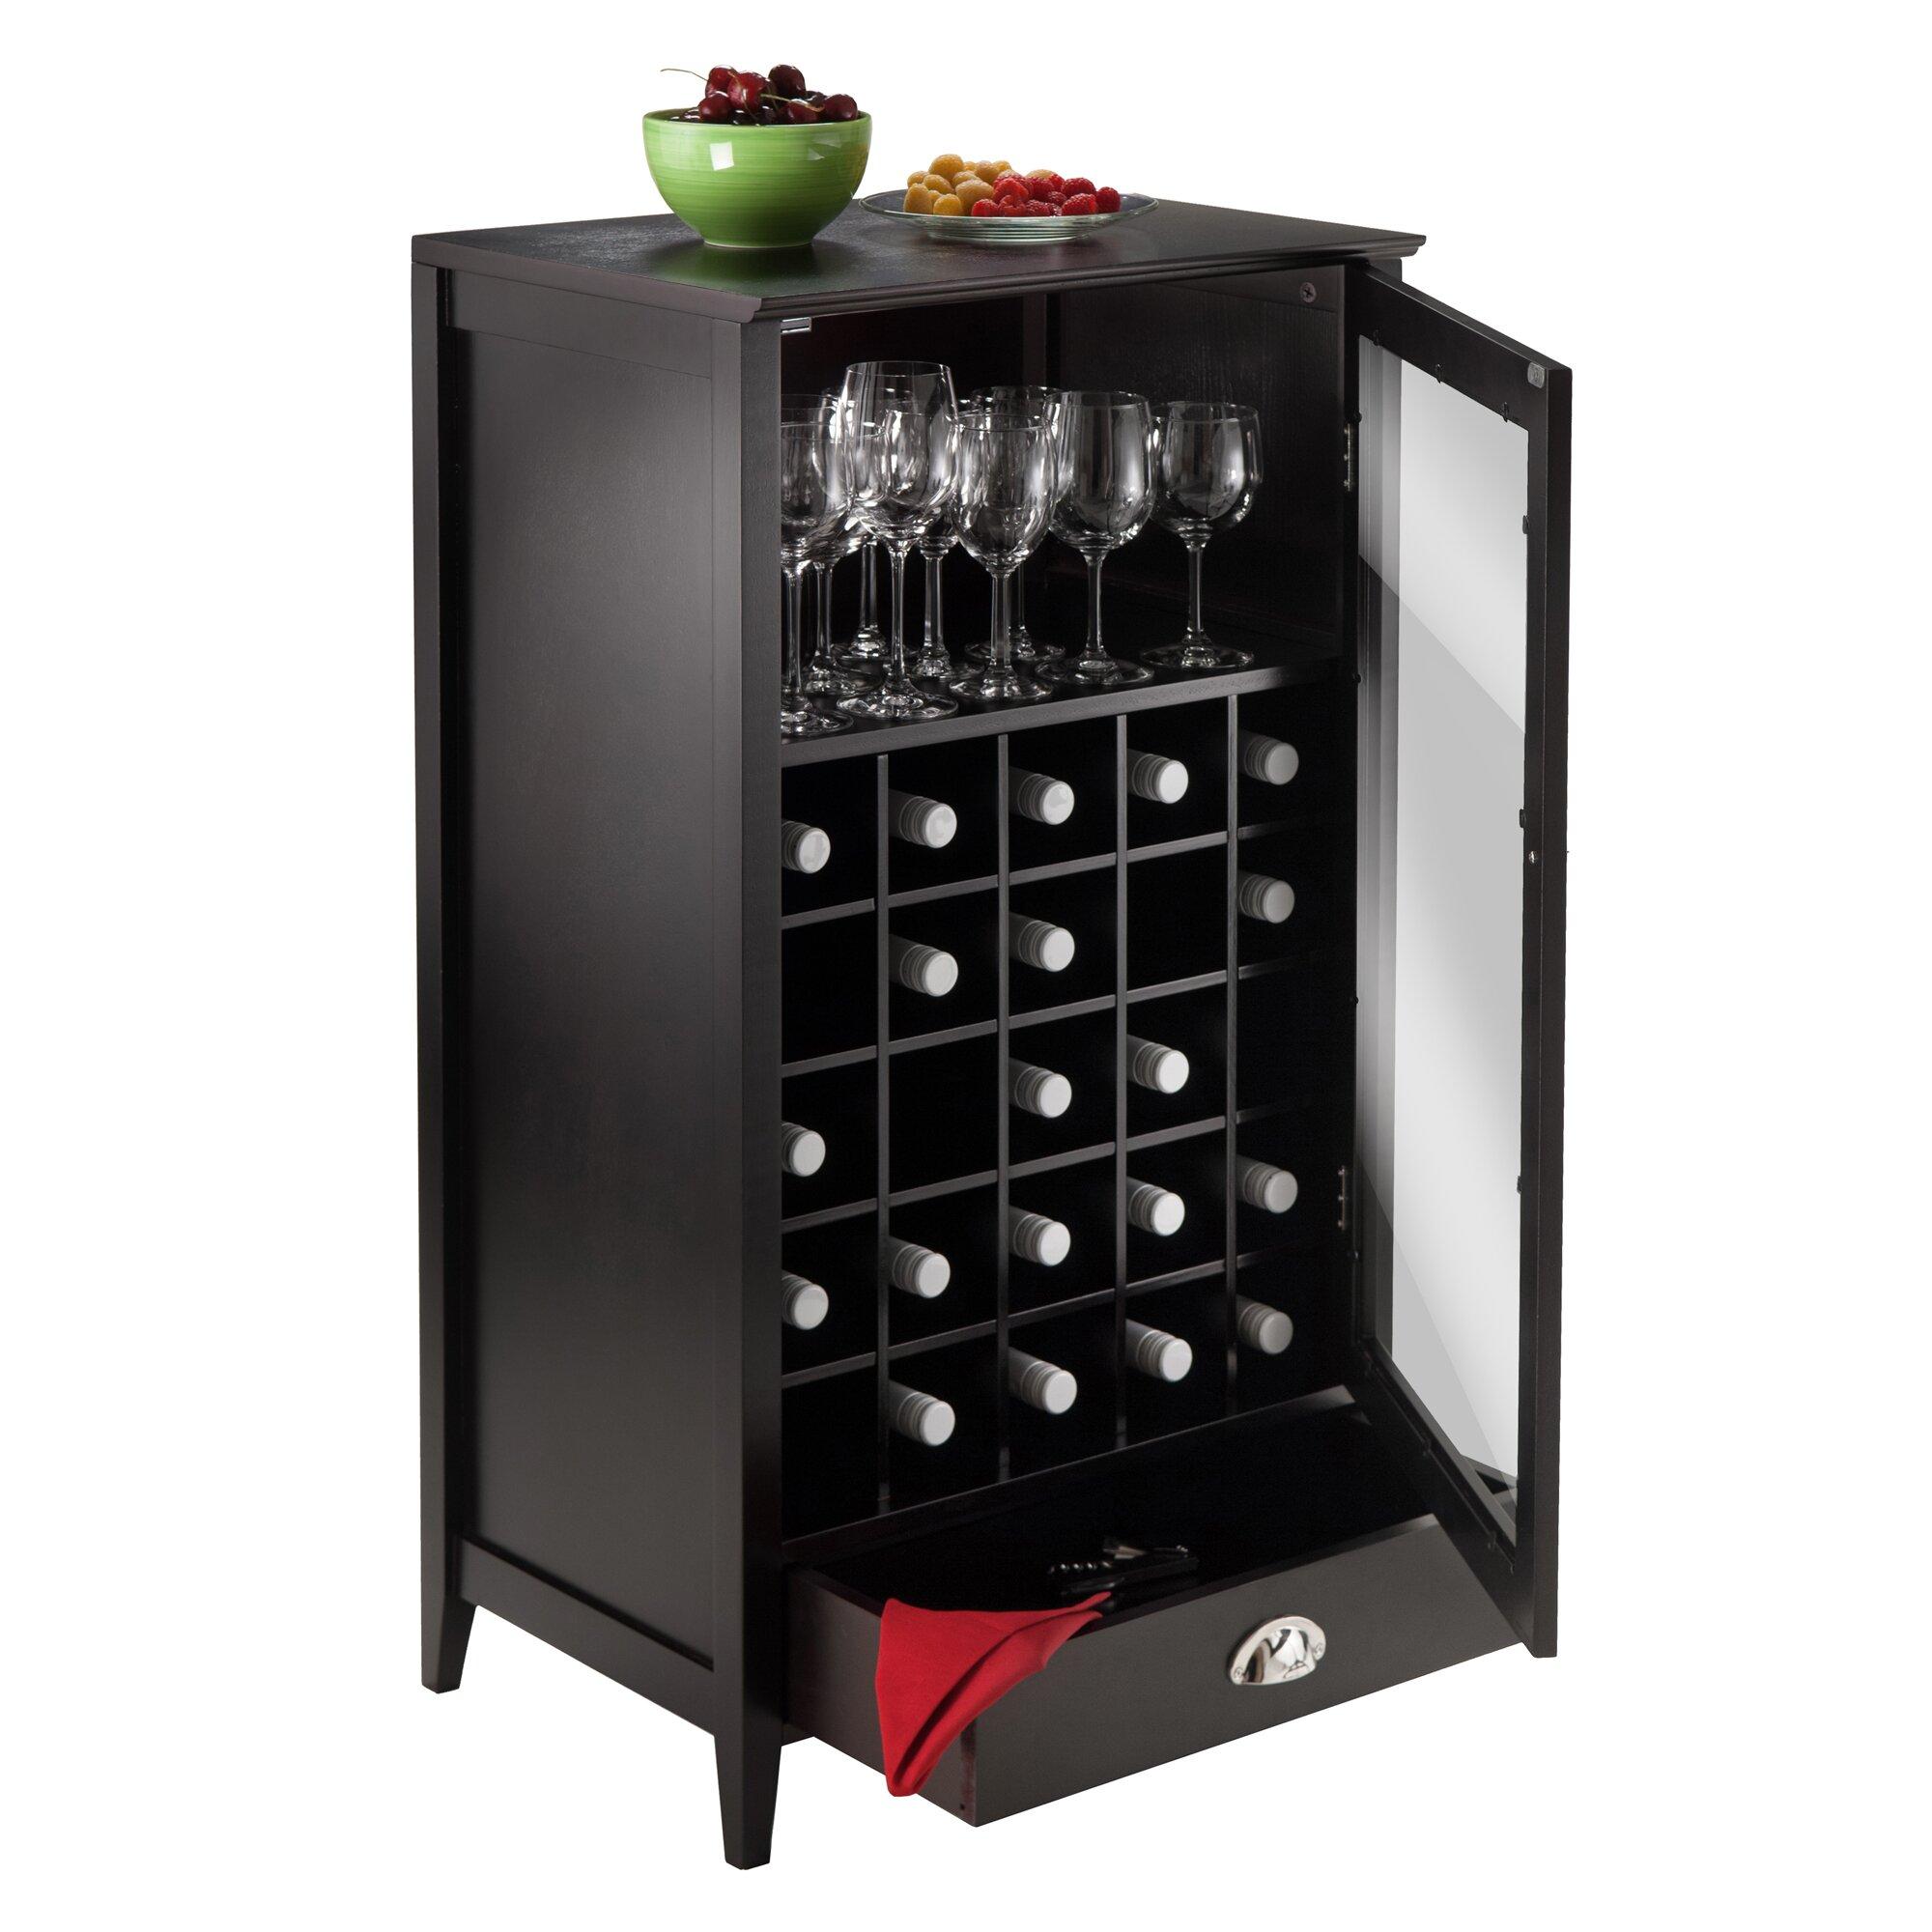 Winsome bordeaux 25 bottle floor wine cabinet reviews for Wine bottle christmas tree frame for sale